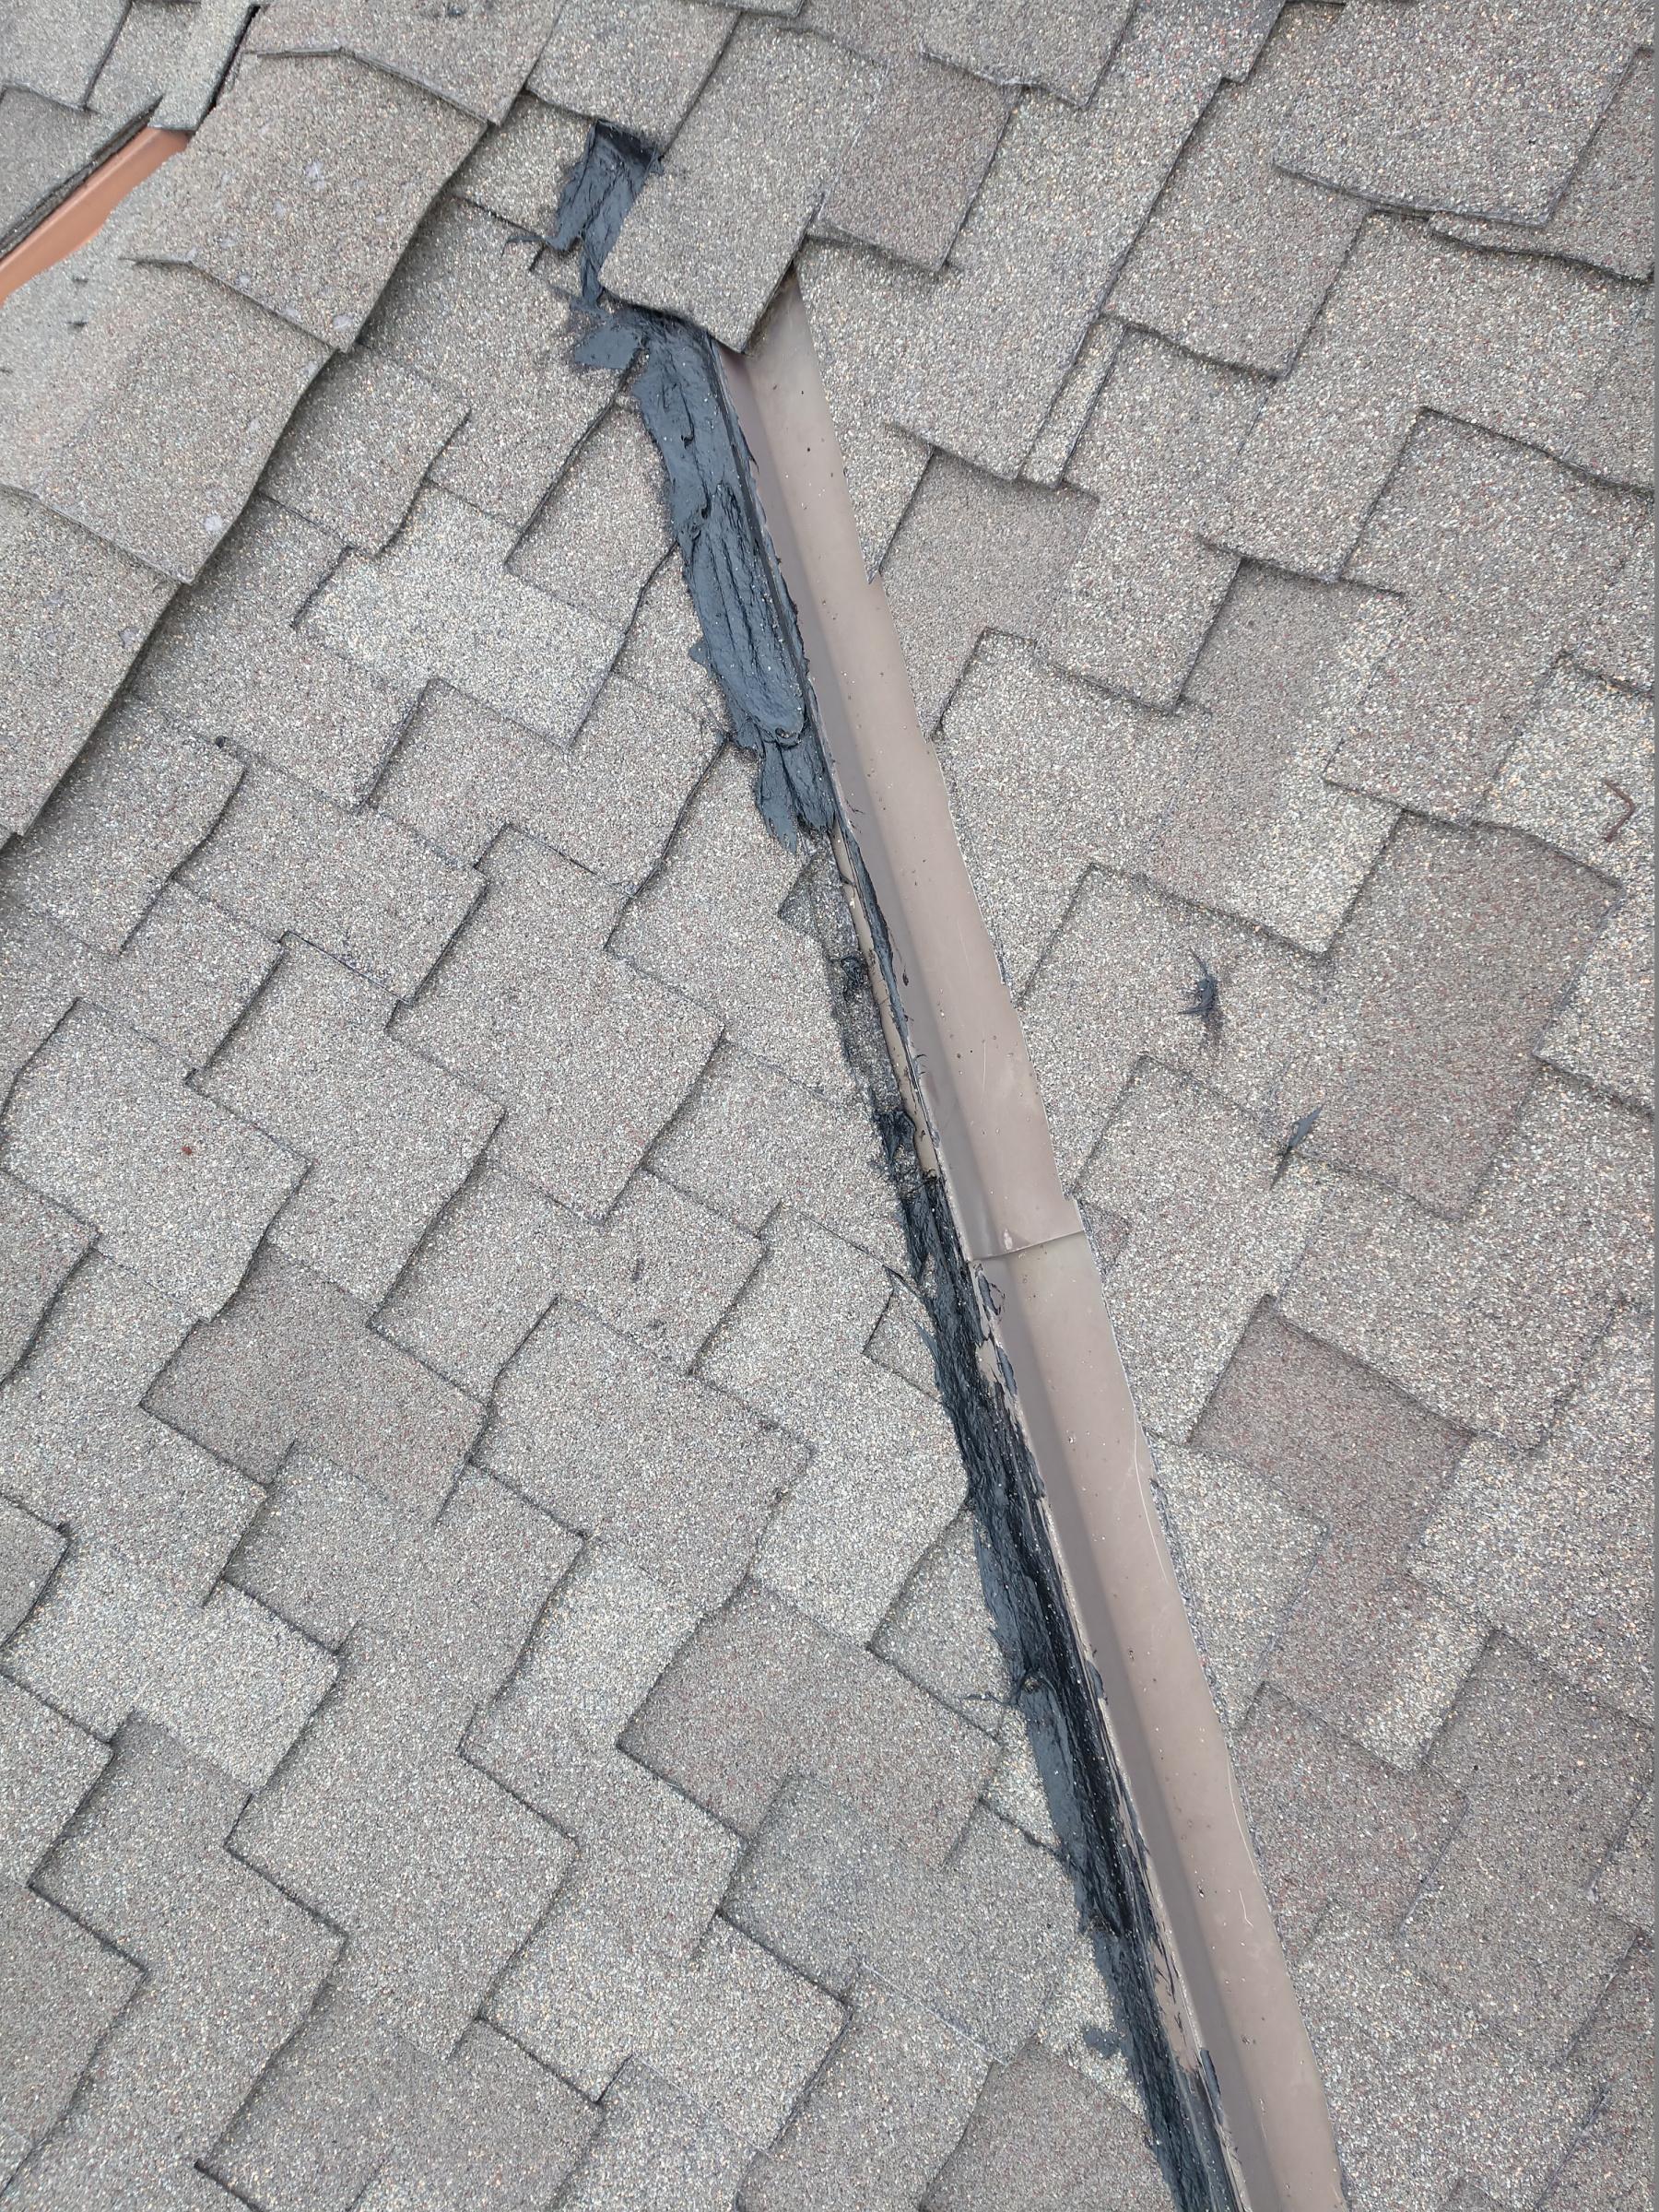 Solatubes removed, now roof leaks-flashing-sealed-1.jpg